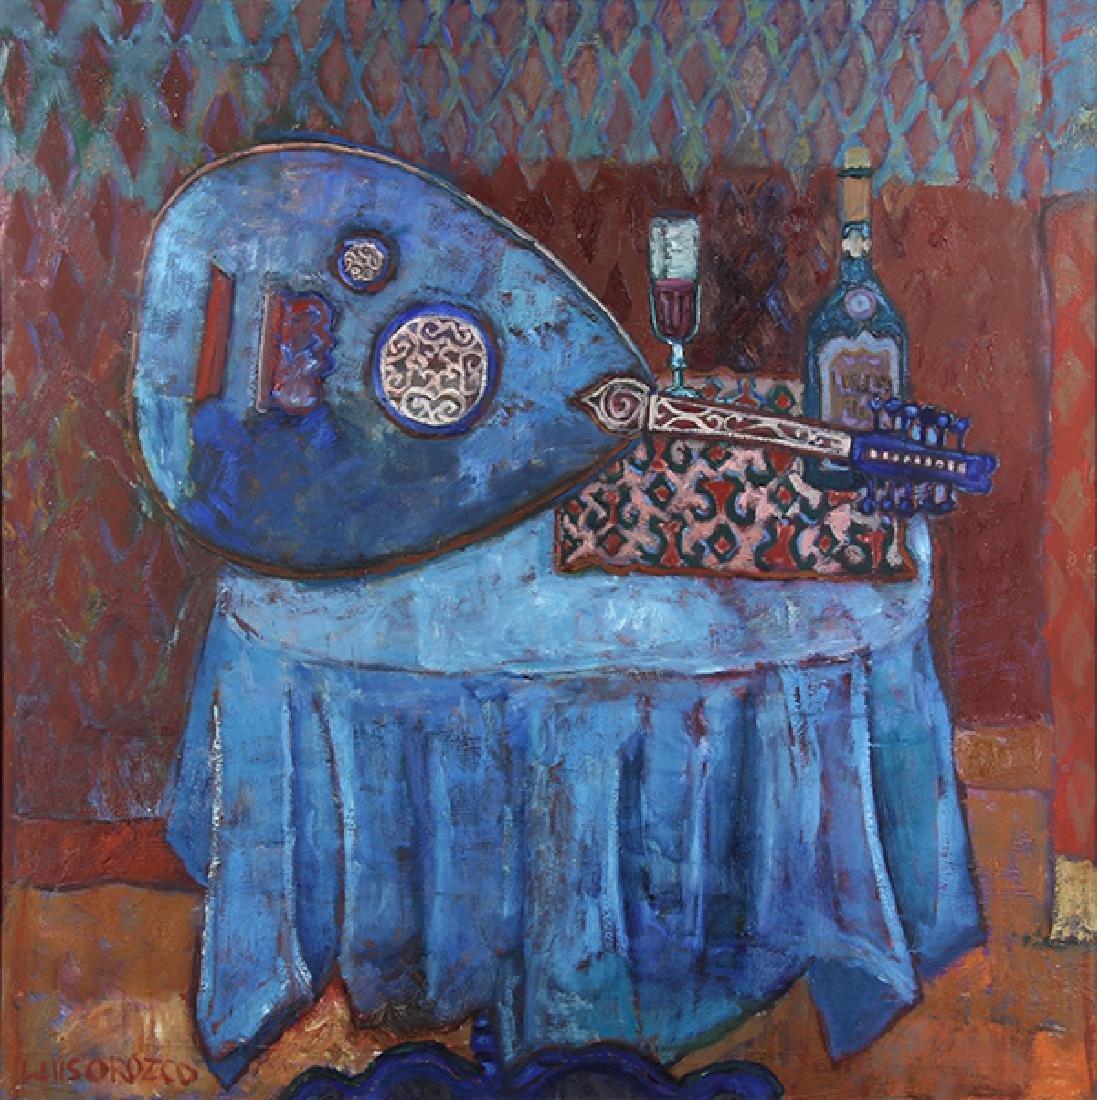 Painting, Luis Orozco